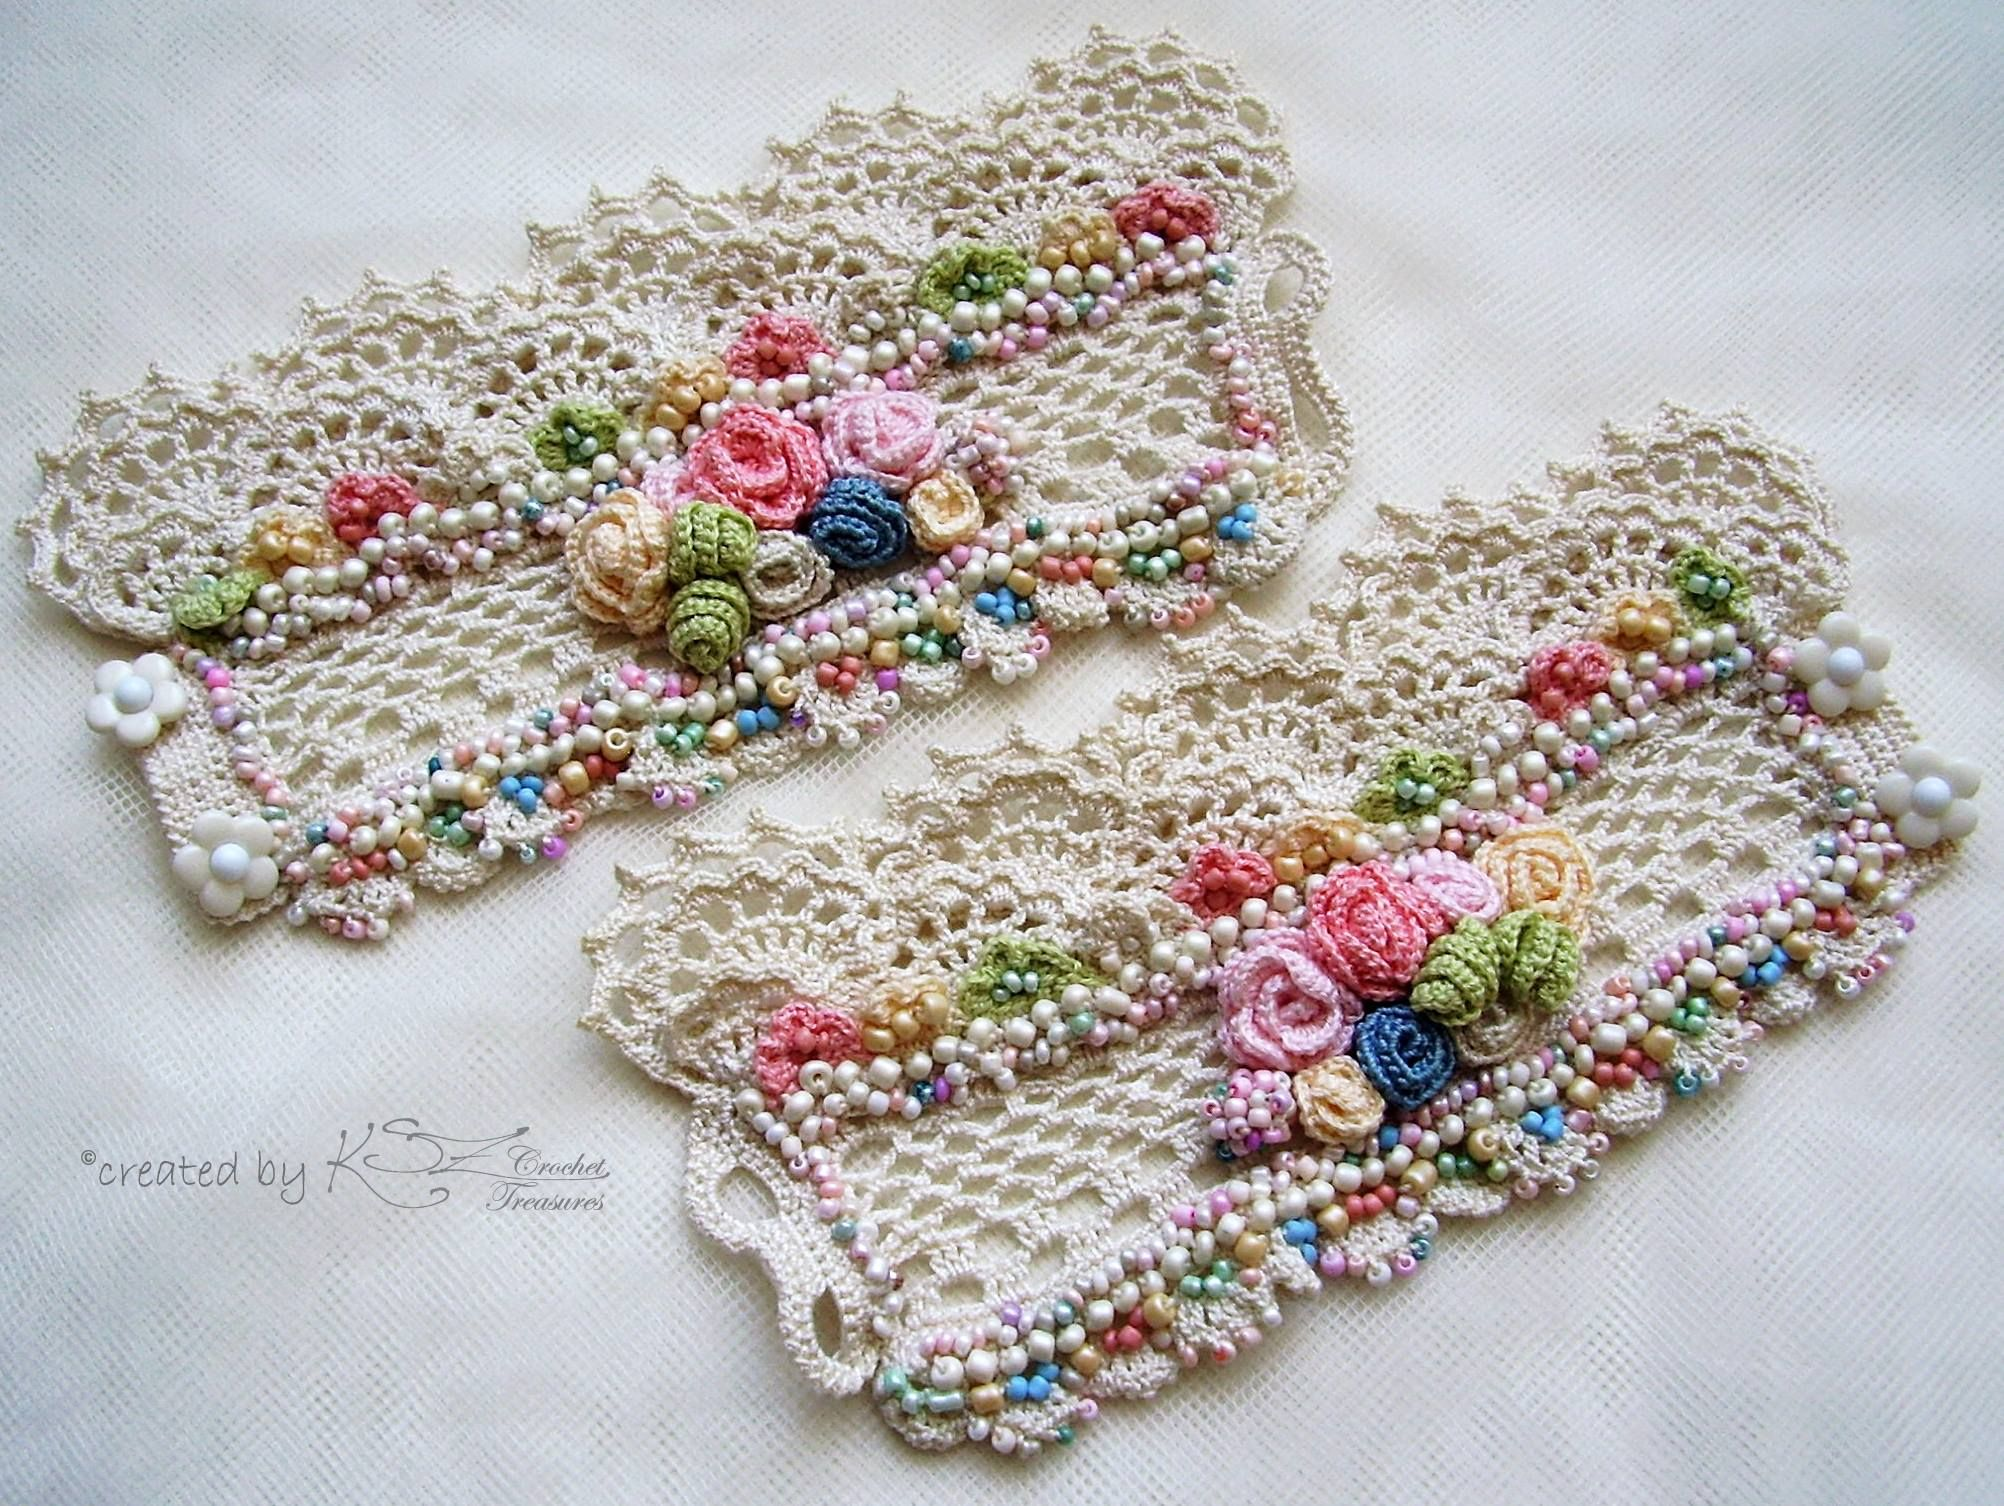 28383613dd23a3cb8fef56bba003150d.jpg (2004×1506) | Fabric Art ...